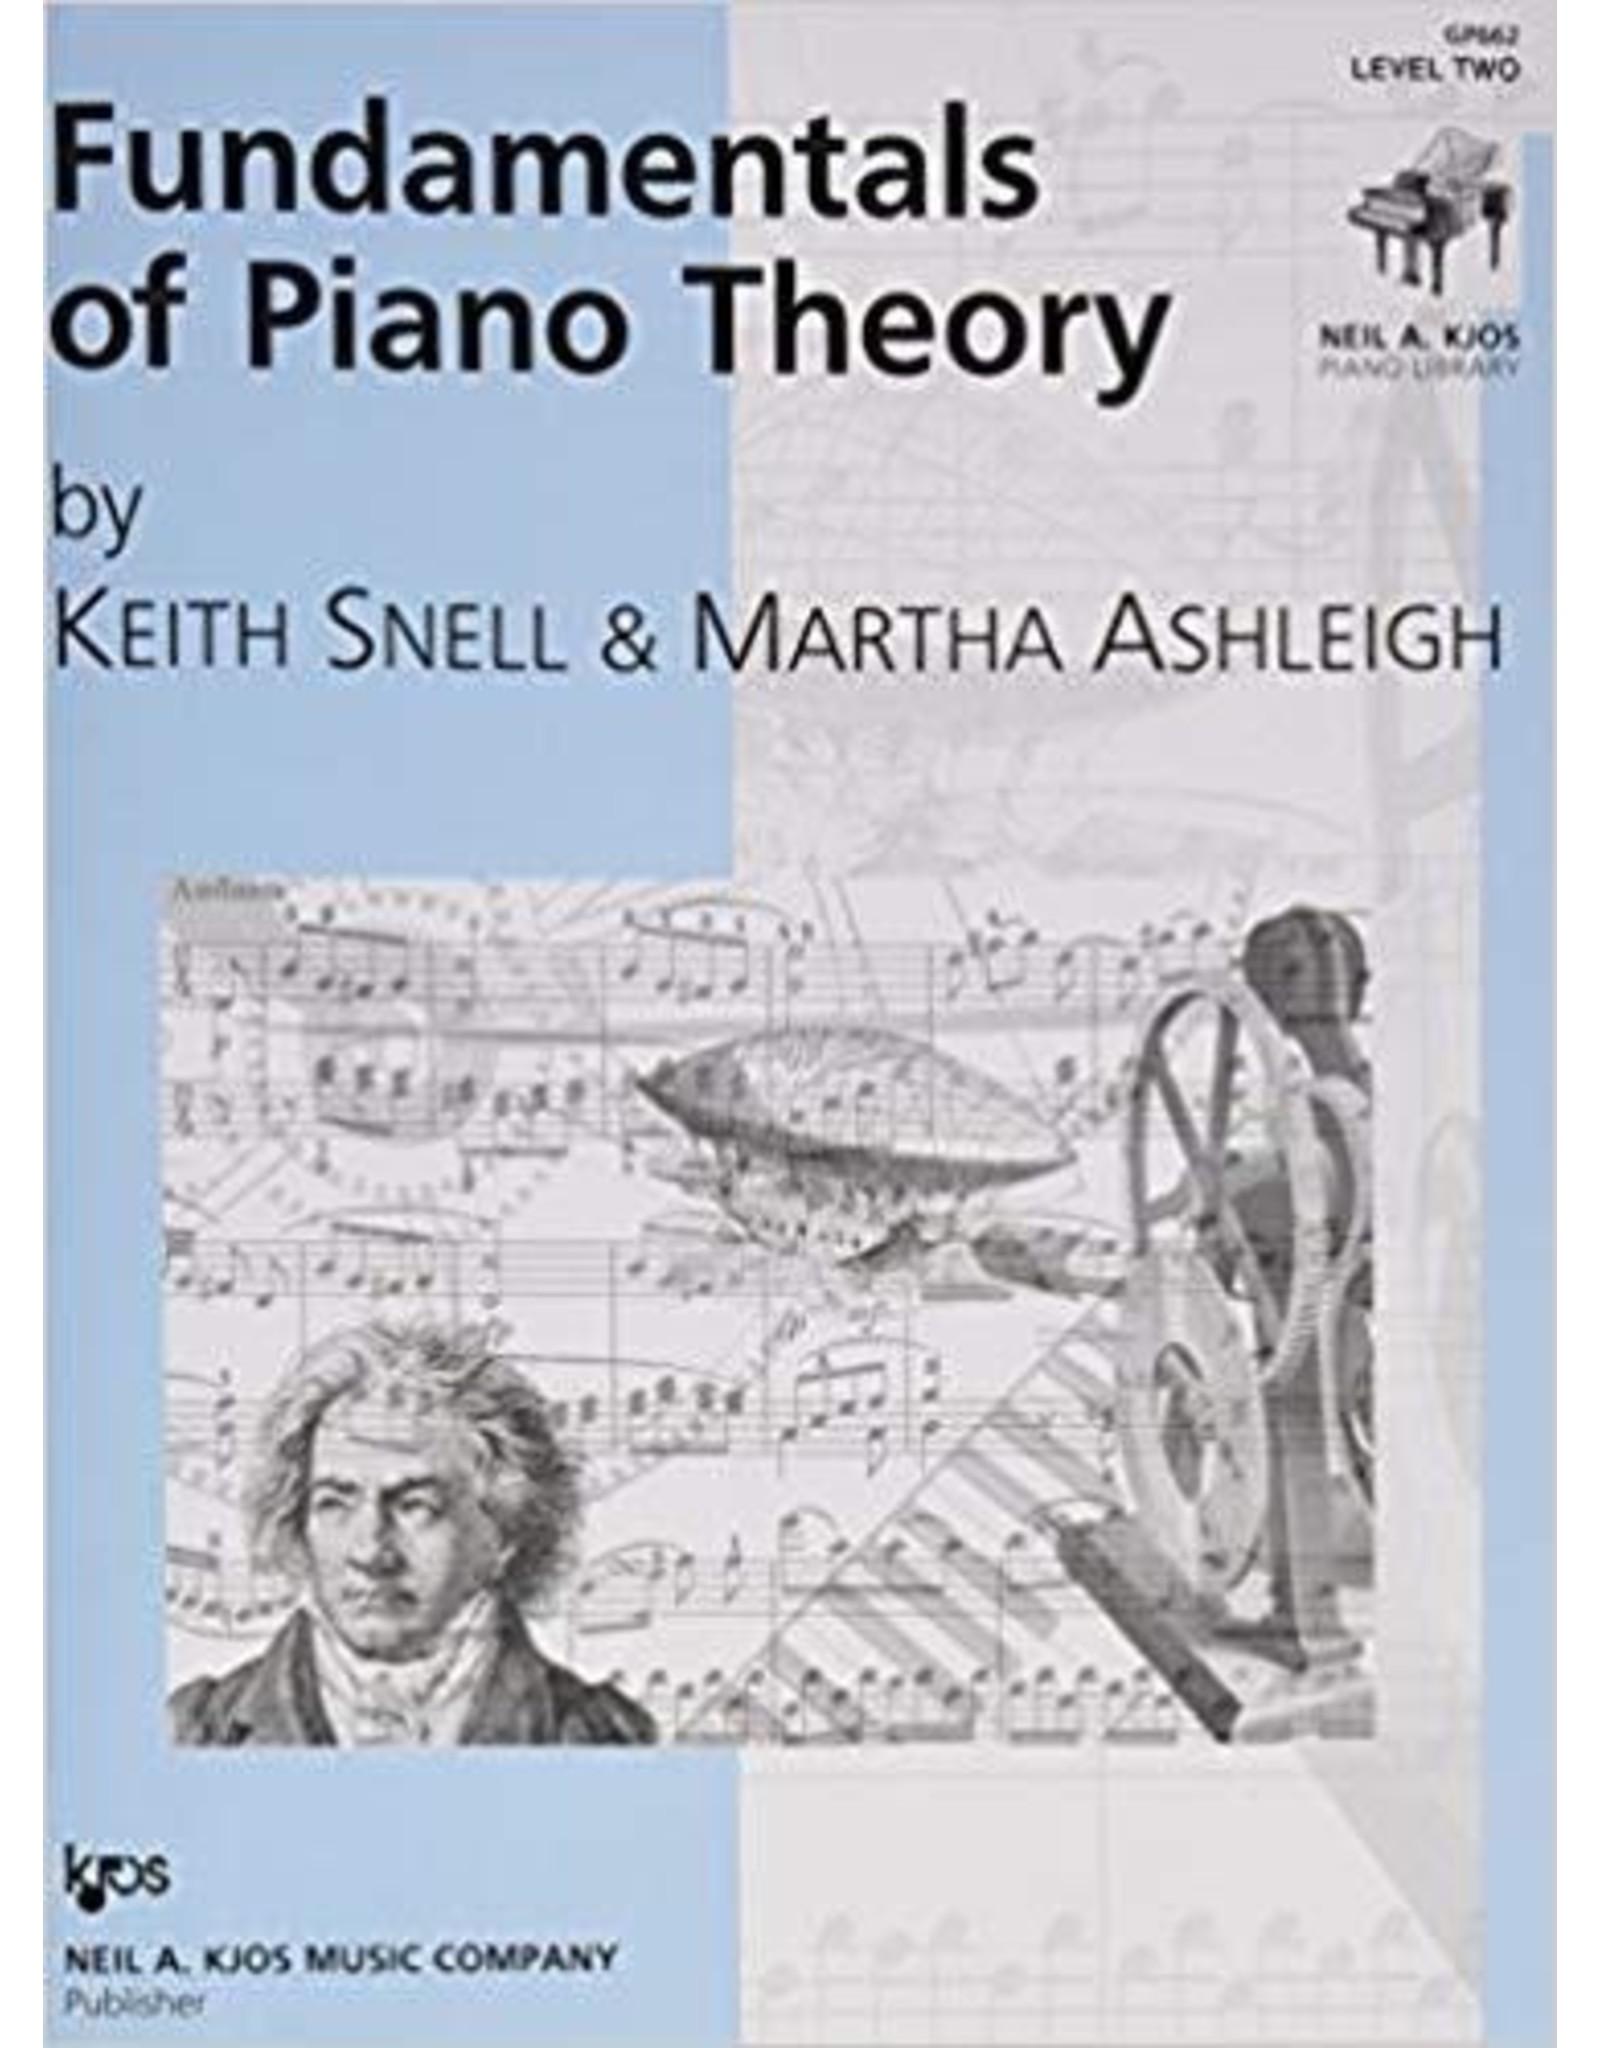 Kjos Fundamentals of Piano Theory, Level 2 Keith Snell